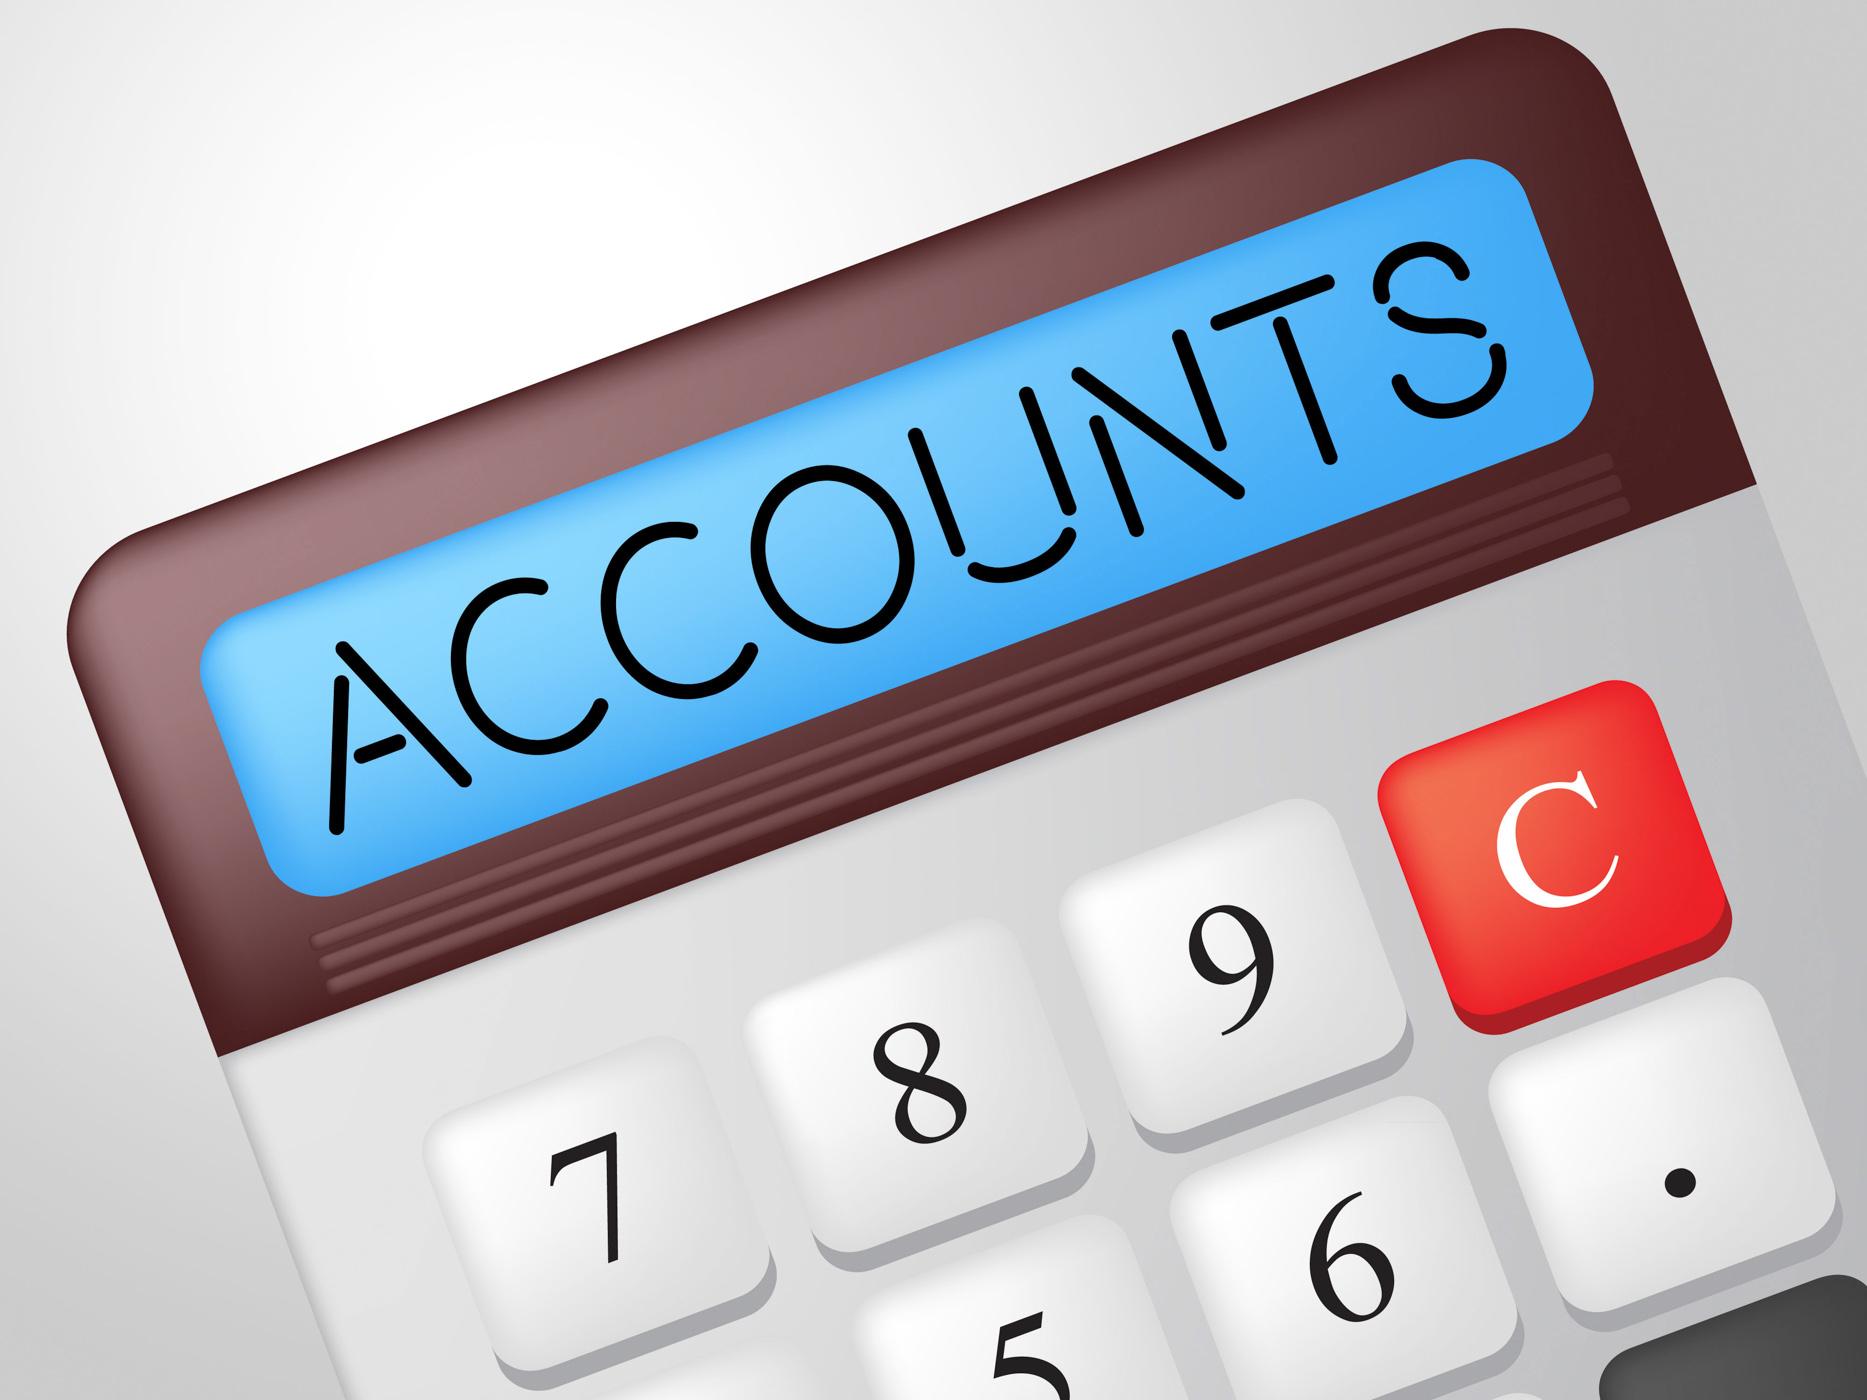 Accounts Calculator Indicates Balancing The Books And Accounting Calculations Calculation Calculate